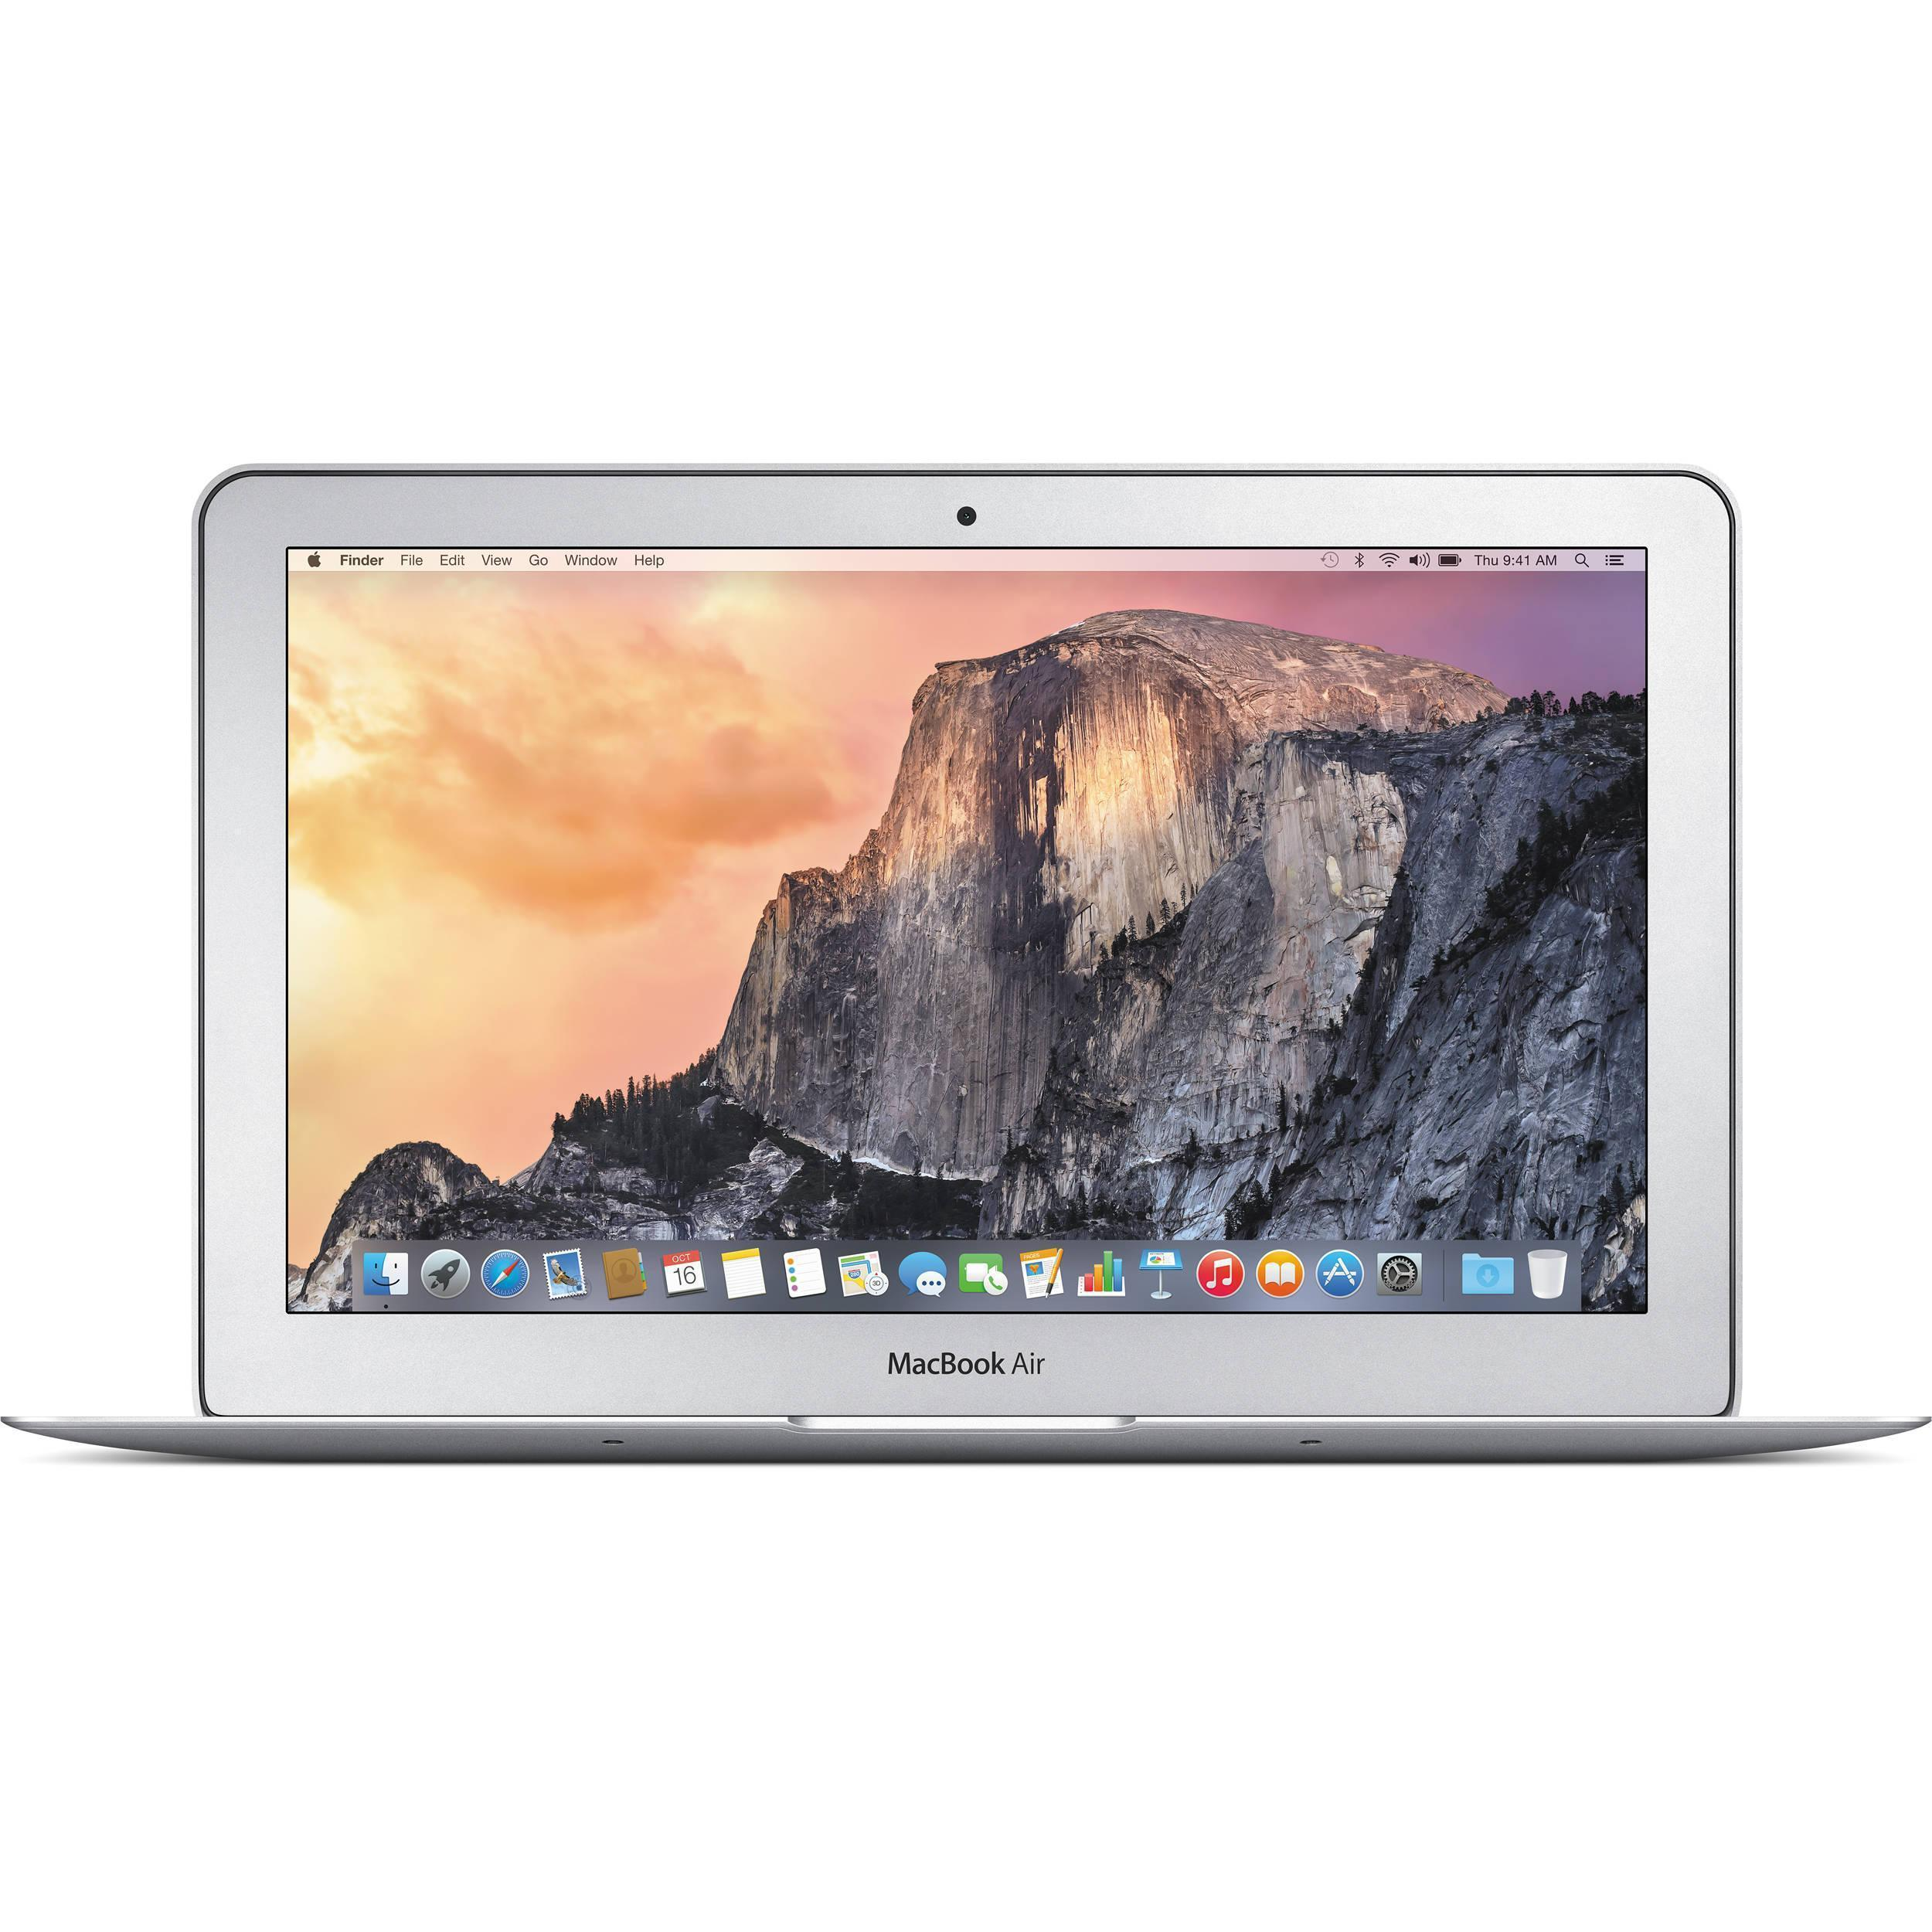 MacBook Air 11,6-inch (2013) - Core i5 - 8GB - SSD 256 GB QWERTY - Inglês (EUA)